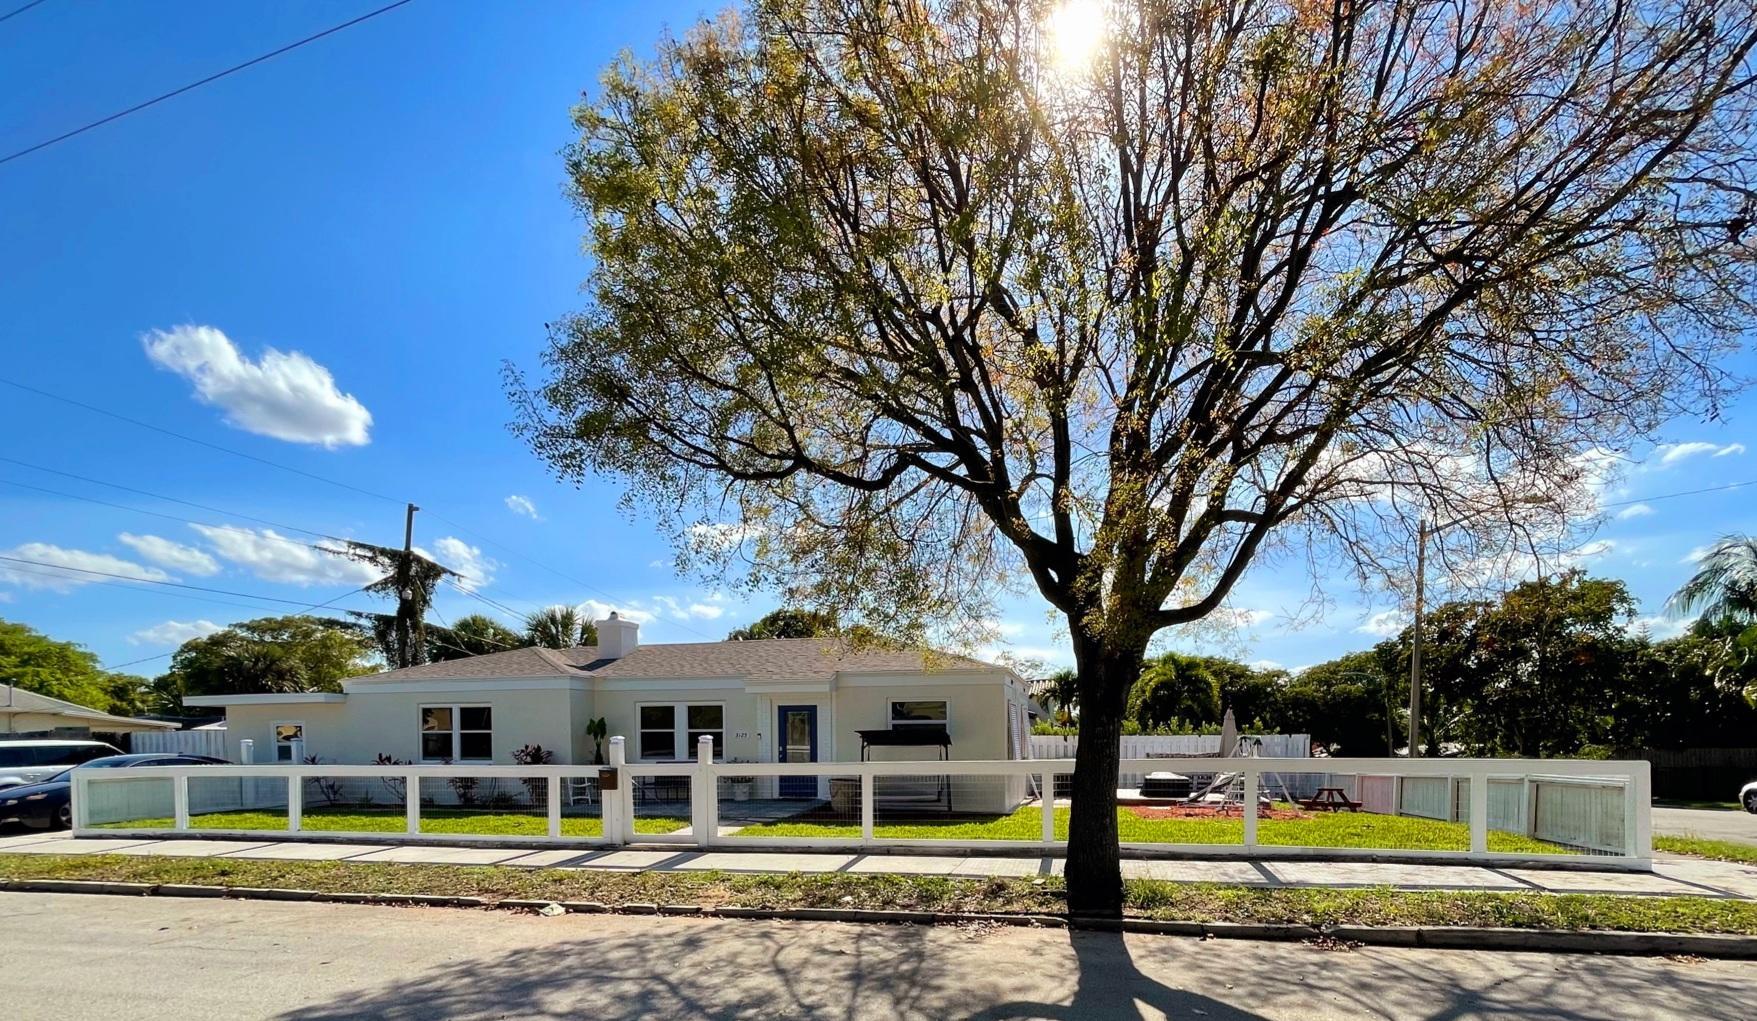 3125 S Terrace Drive  For Sale 10715016, FL